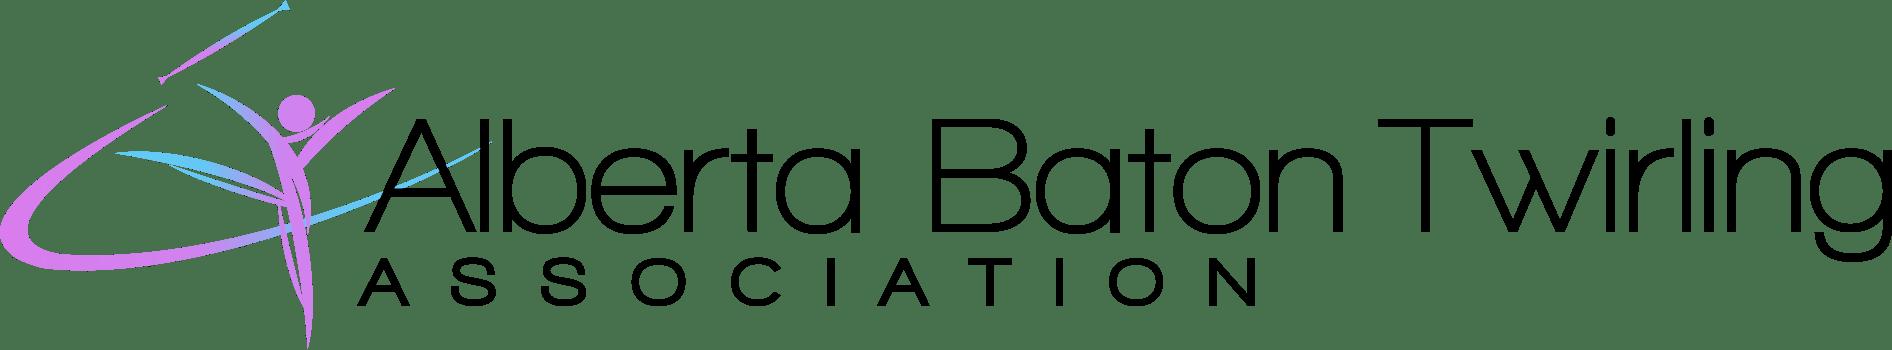 Alberta Baton Twirling Association